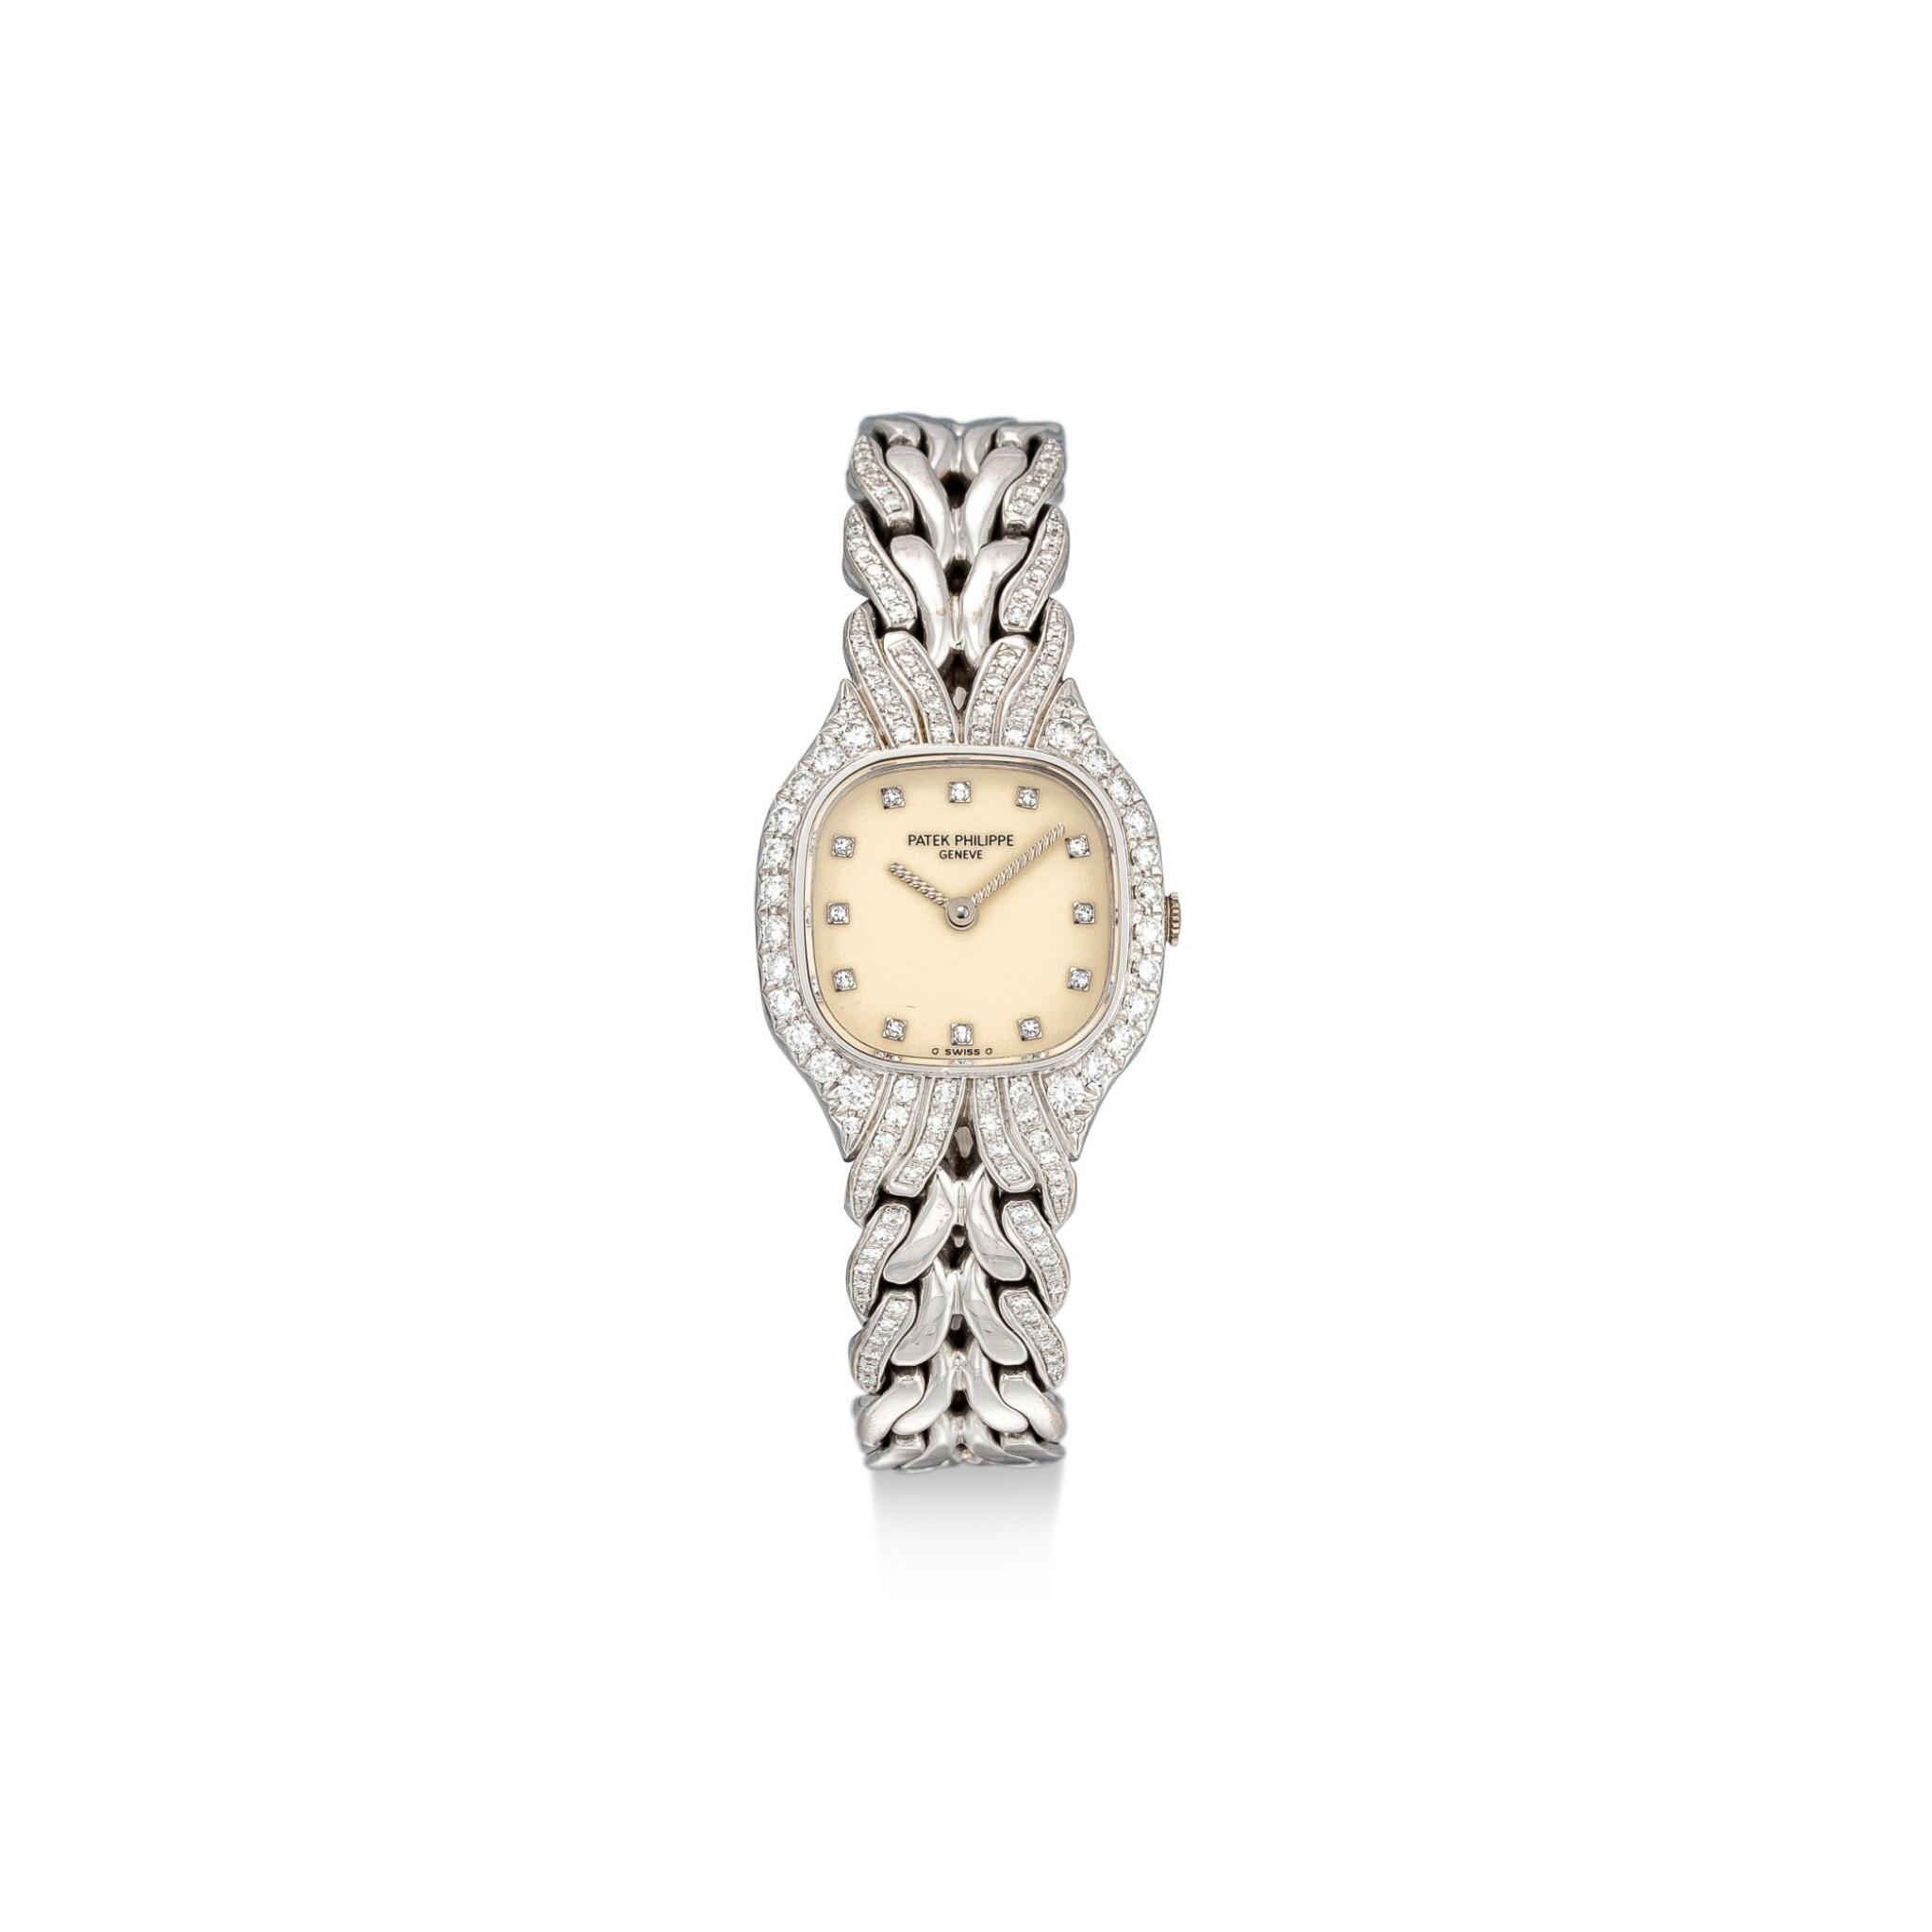 View full screen - View 1 of Lot 8087. PATEK PHILIPPE | LA FLAMME, REFERENCE 4815/3 | A WHITE GOLD AND DIAMOND-SET BRACELET WATCH, CIRCA 1990 | 百達翡麗 | La Flamme 型號4815/ 3 白金鑲鑽石鏈帶腕錶,約1994年製.